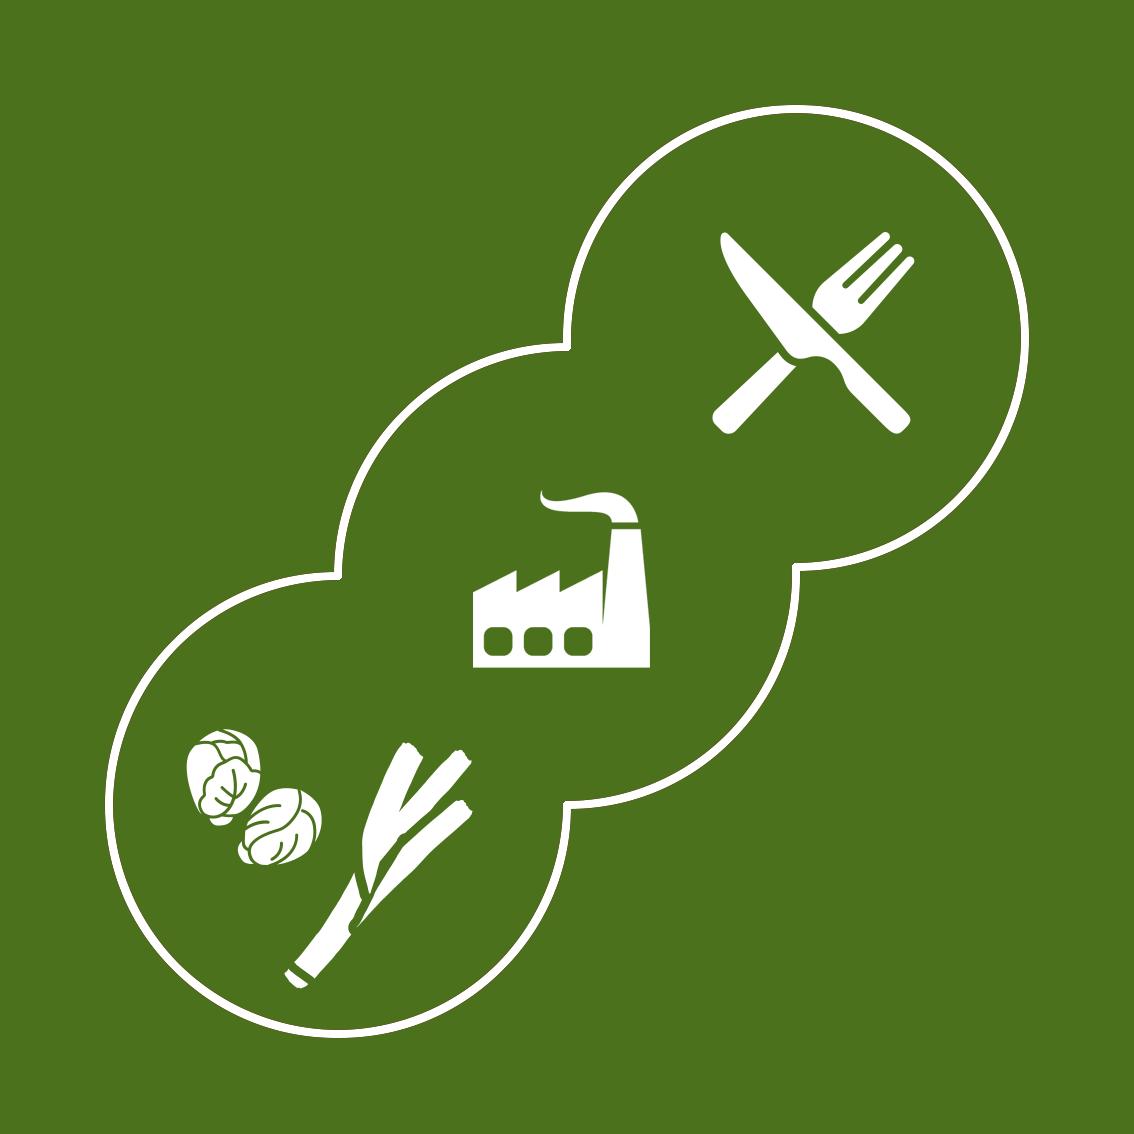 Veggiechain logo